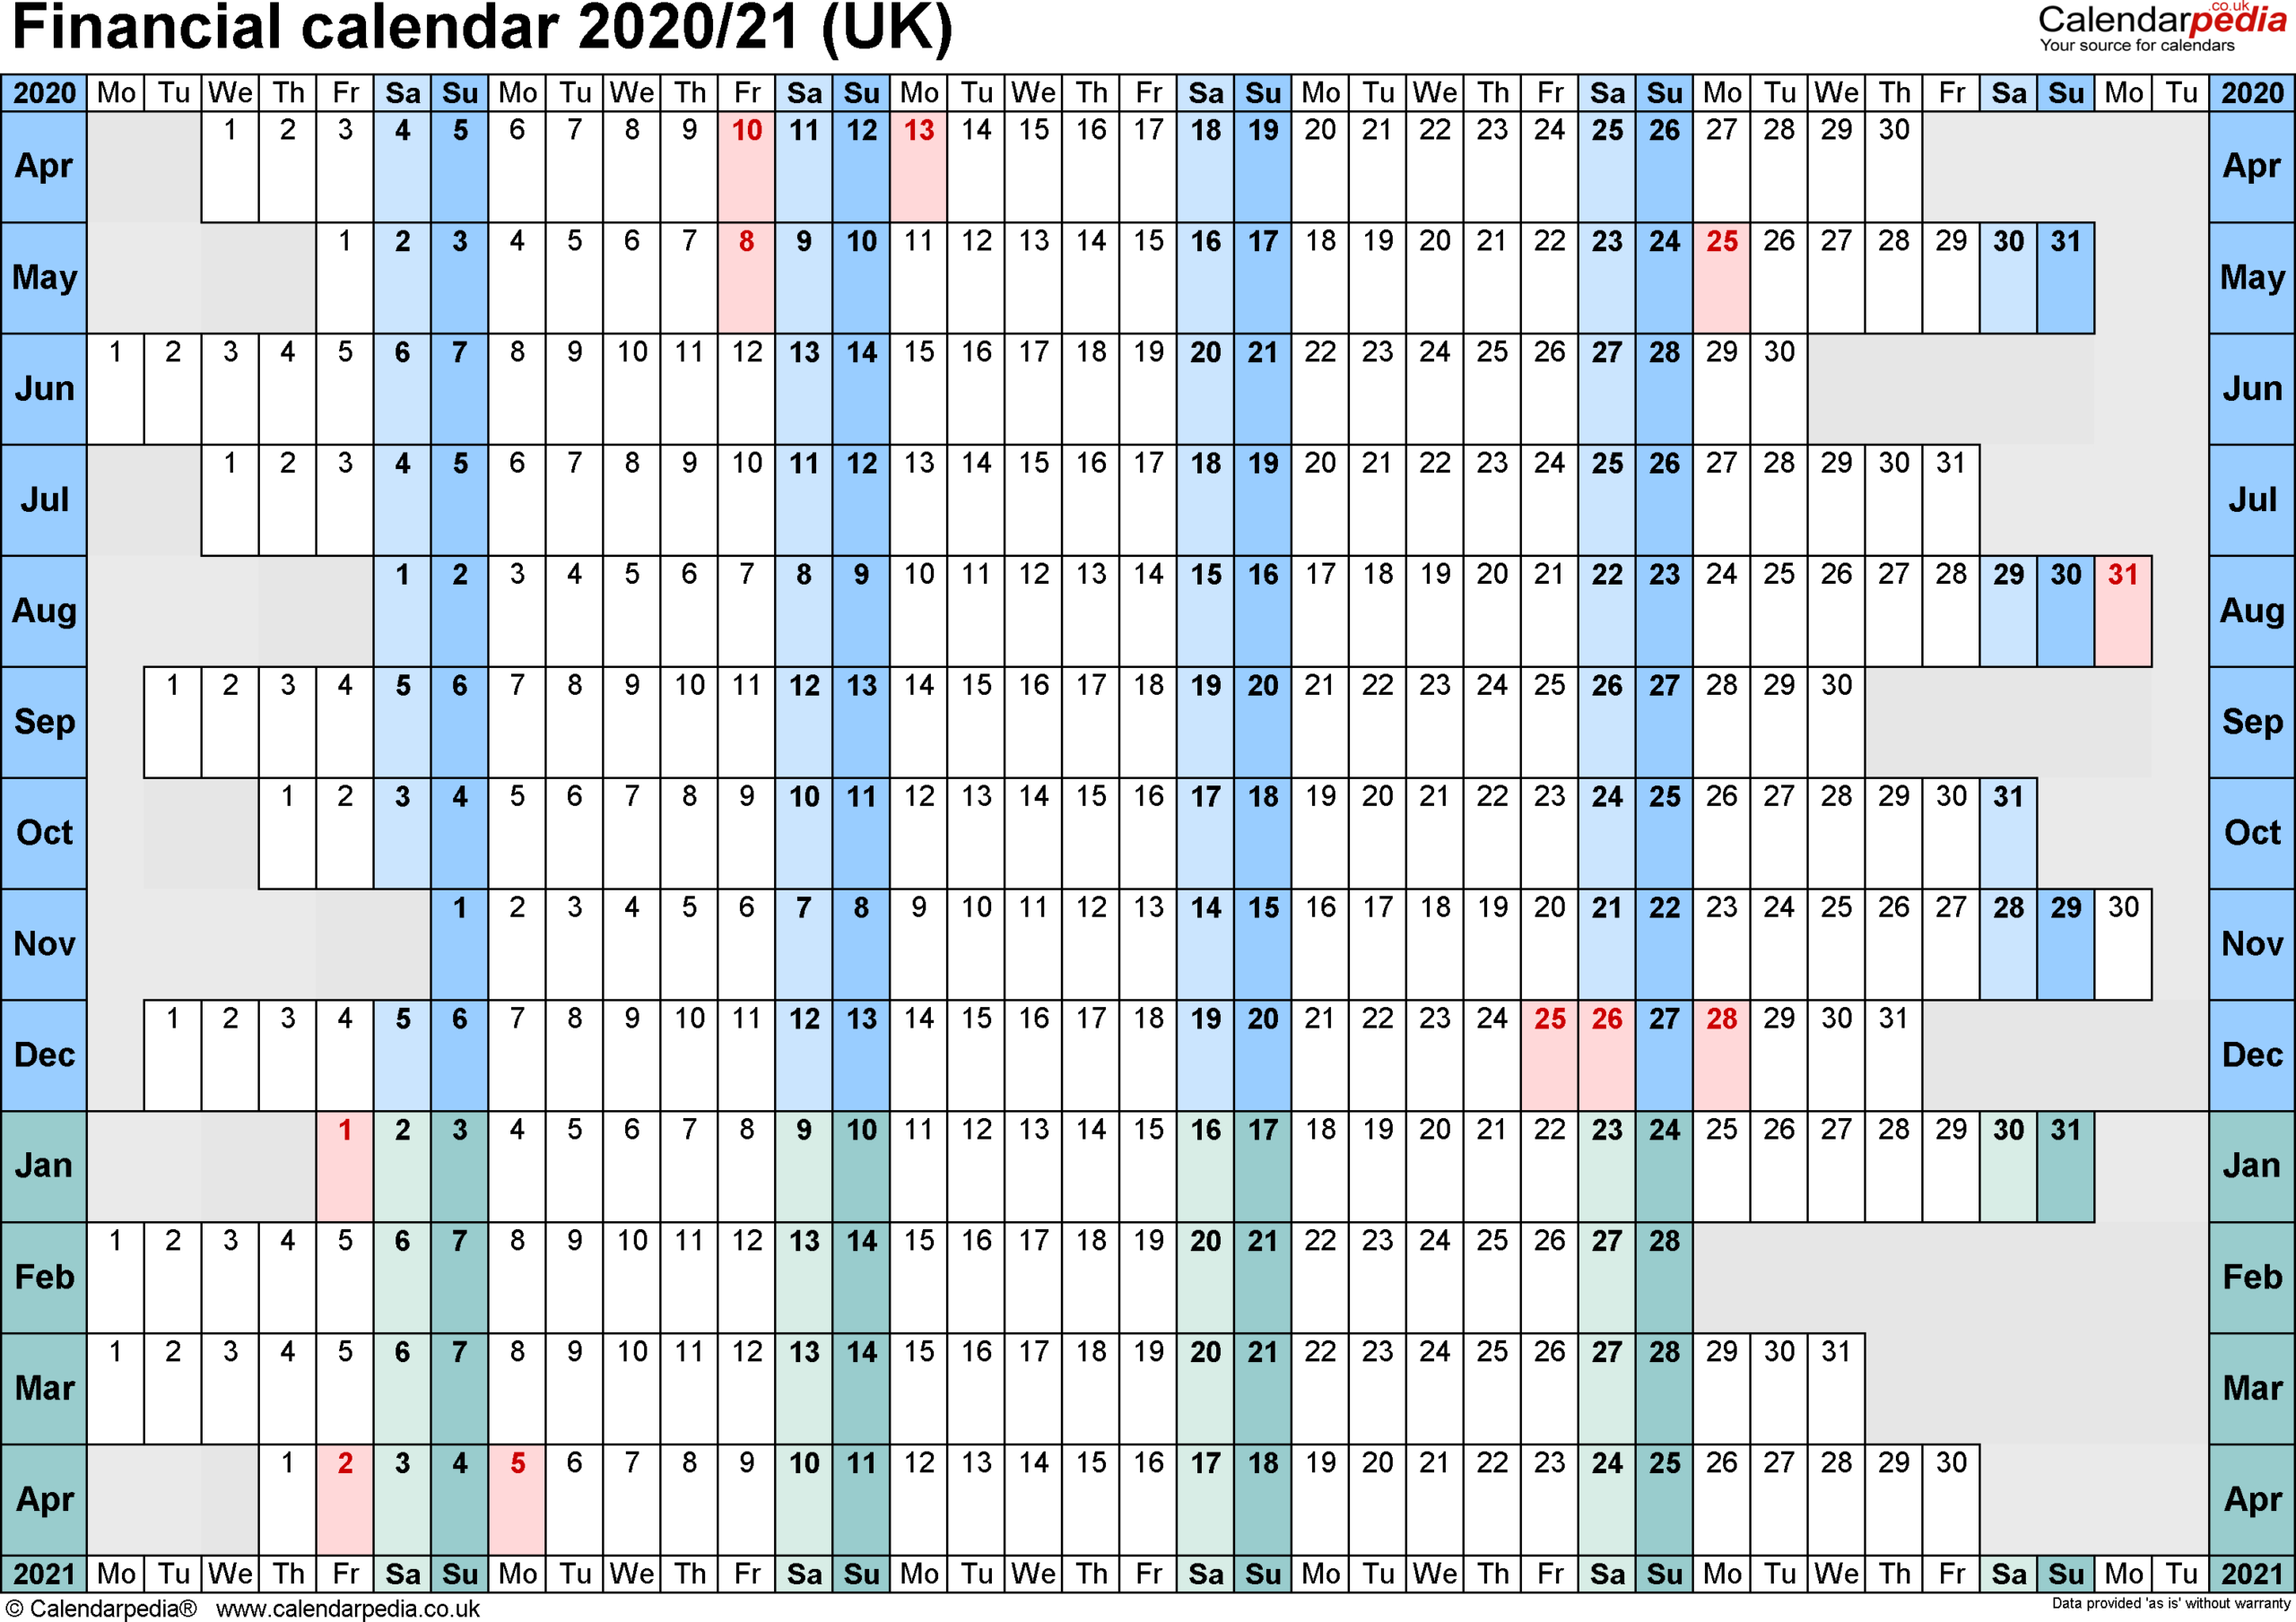 Payroll Tax Calendar 202021 Sage | Payroll Calendar 2020 with Financial Calendar 2021/21 Excel